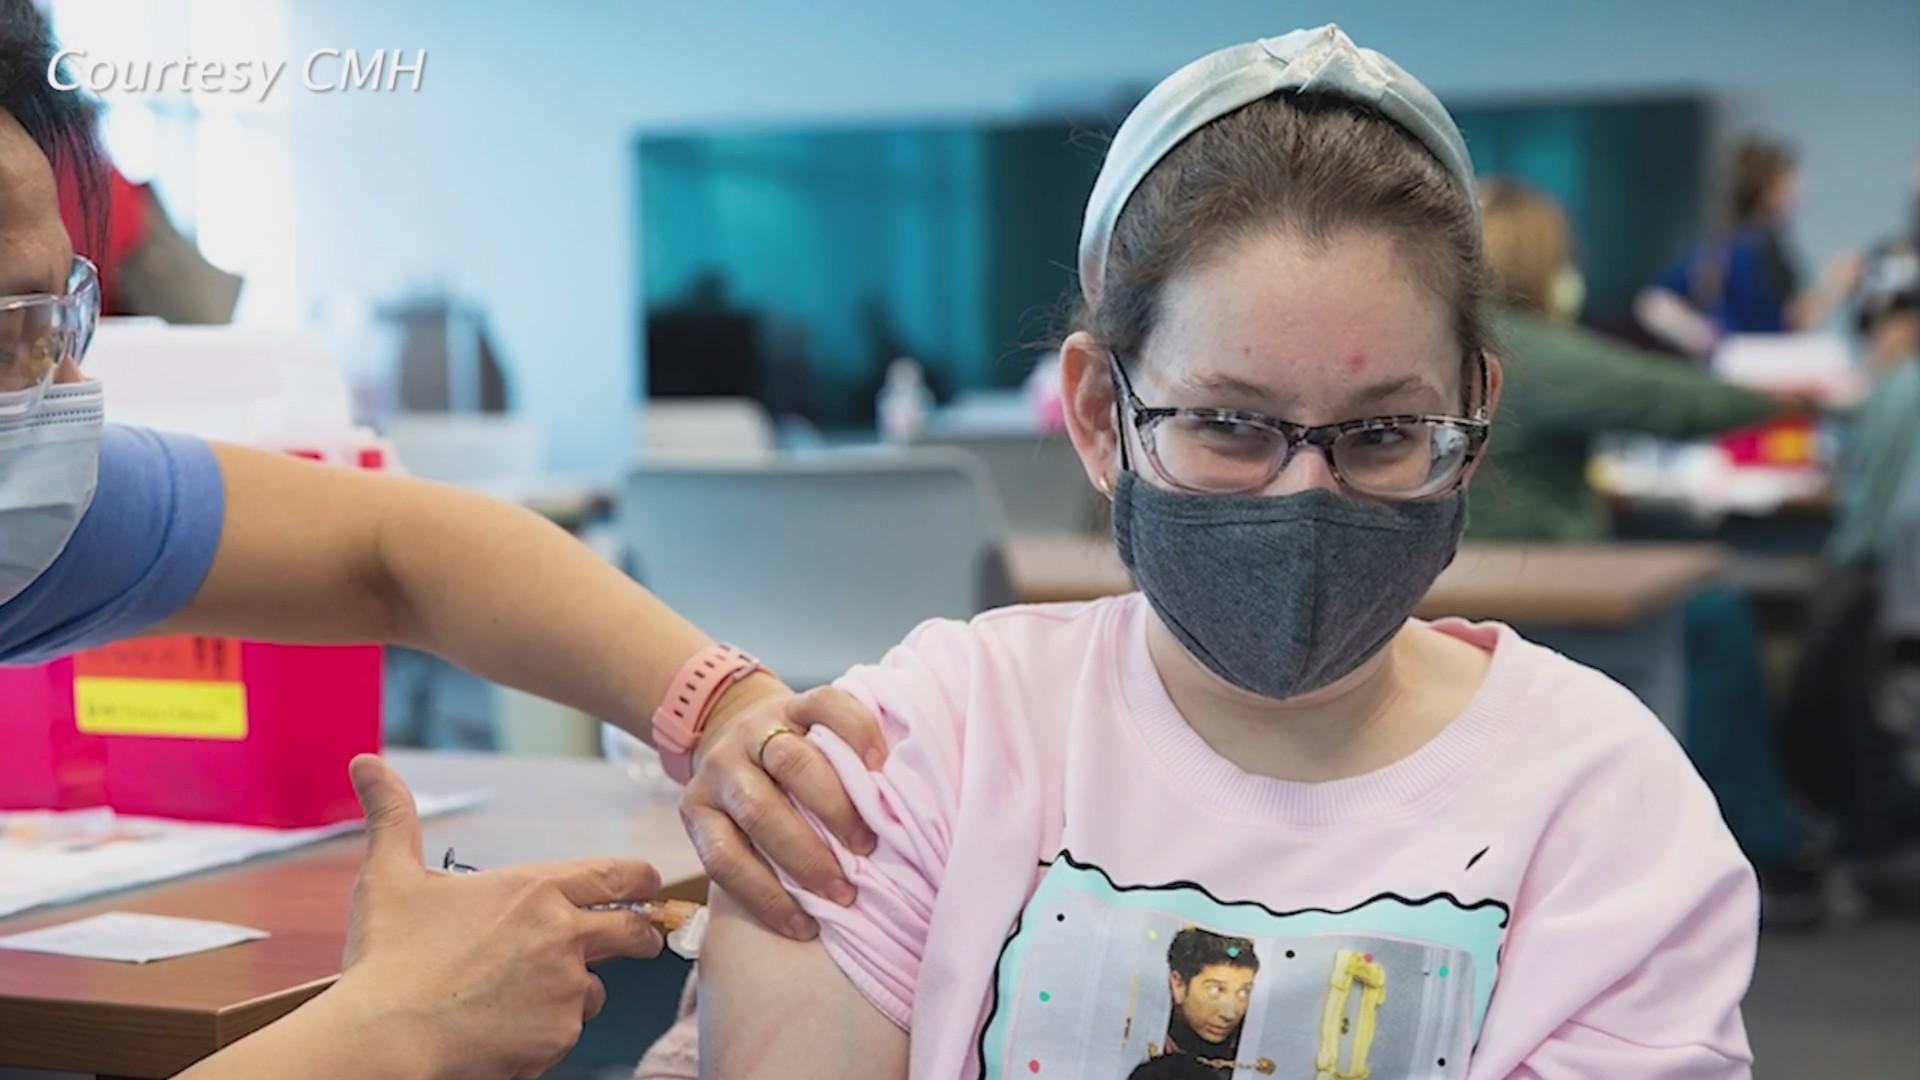 Children's Mercy teen COVID-19 vaccinations